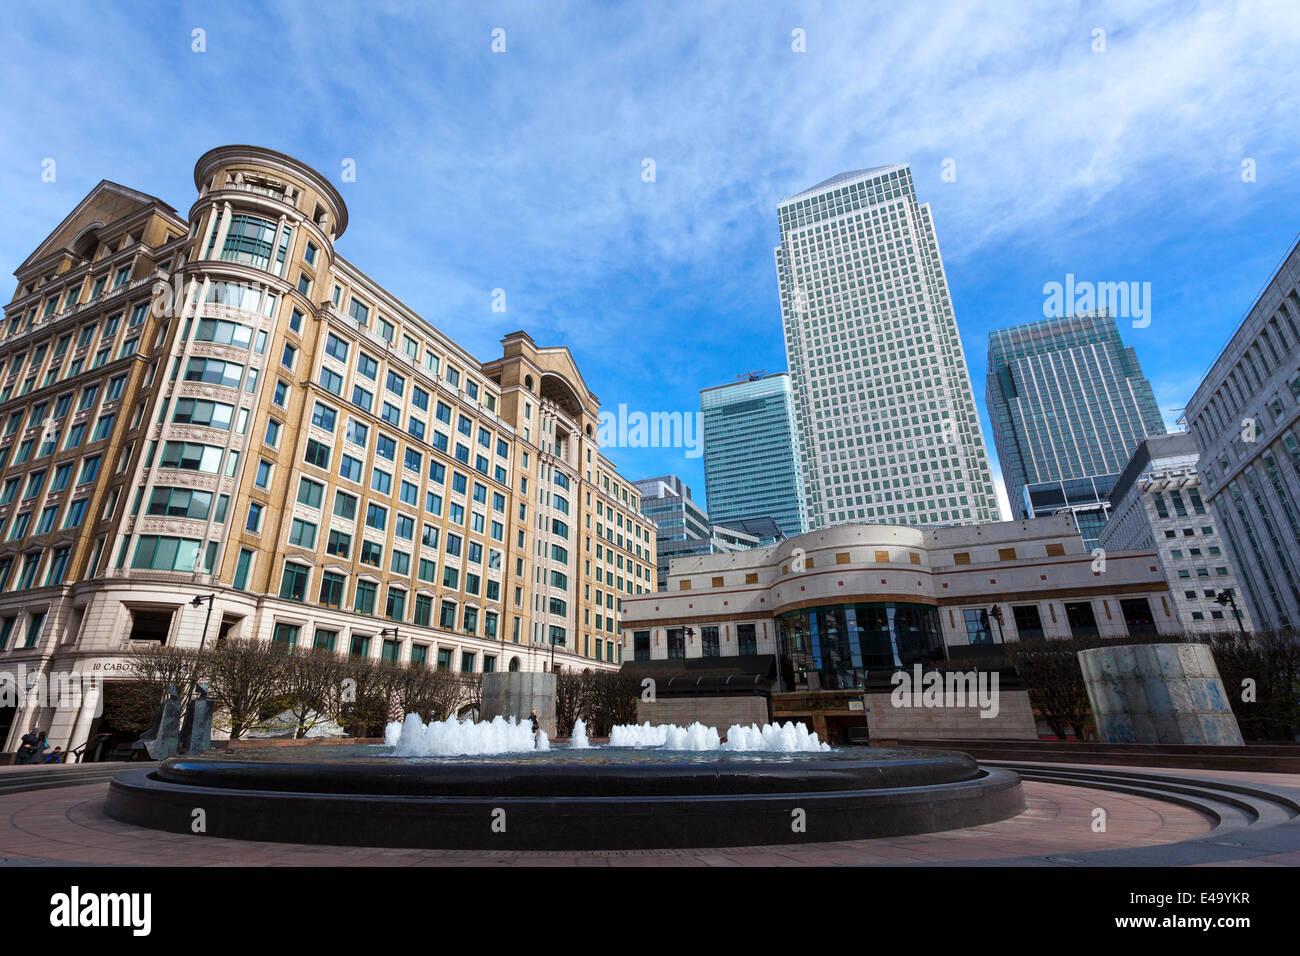 Cabot Square, Canary Wharf, Docklands, London, England, United Kingdom, Europe - Stock Image